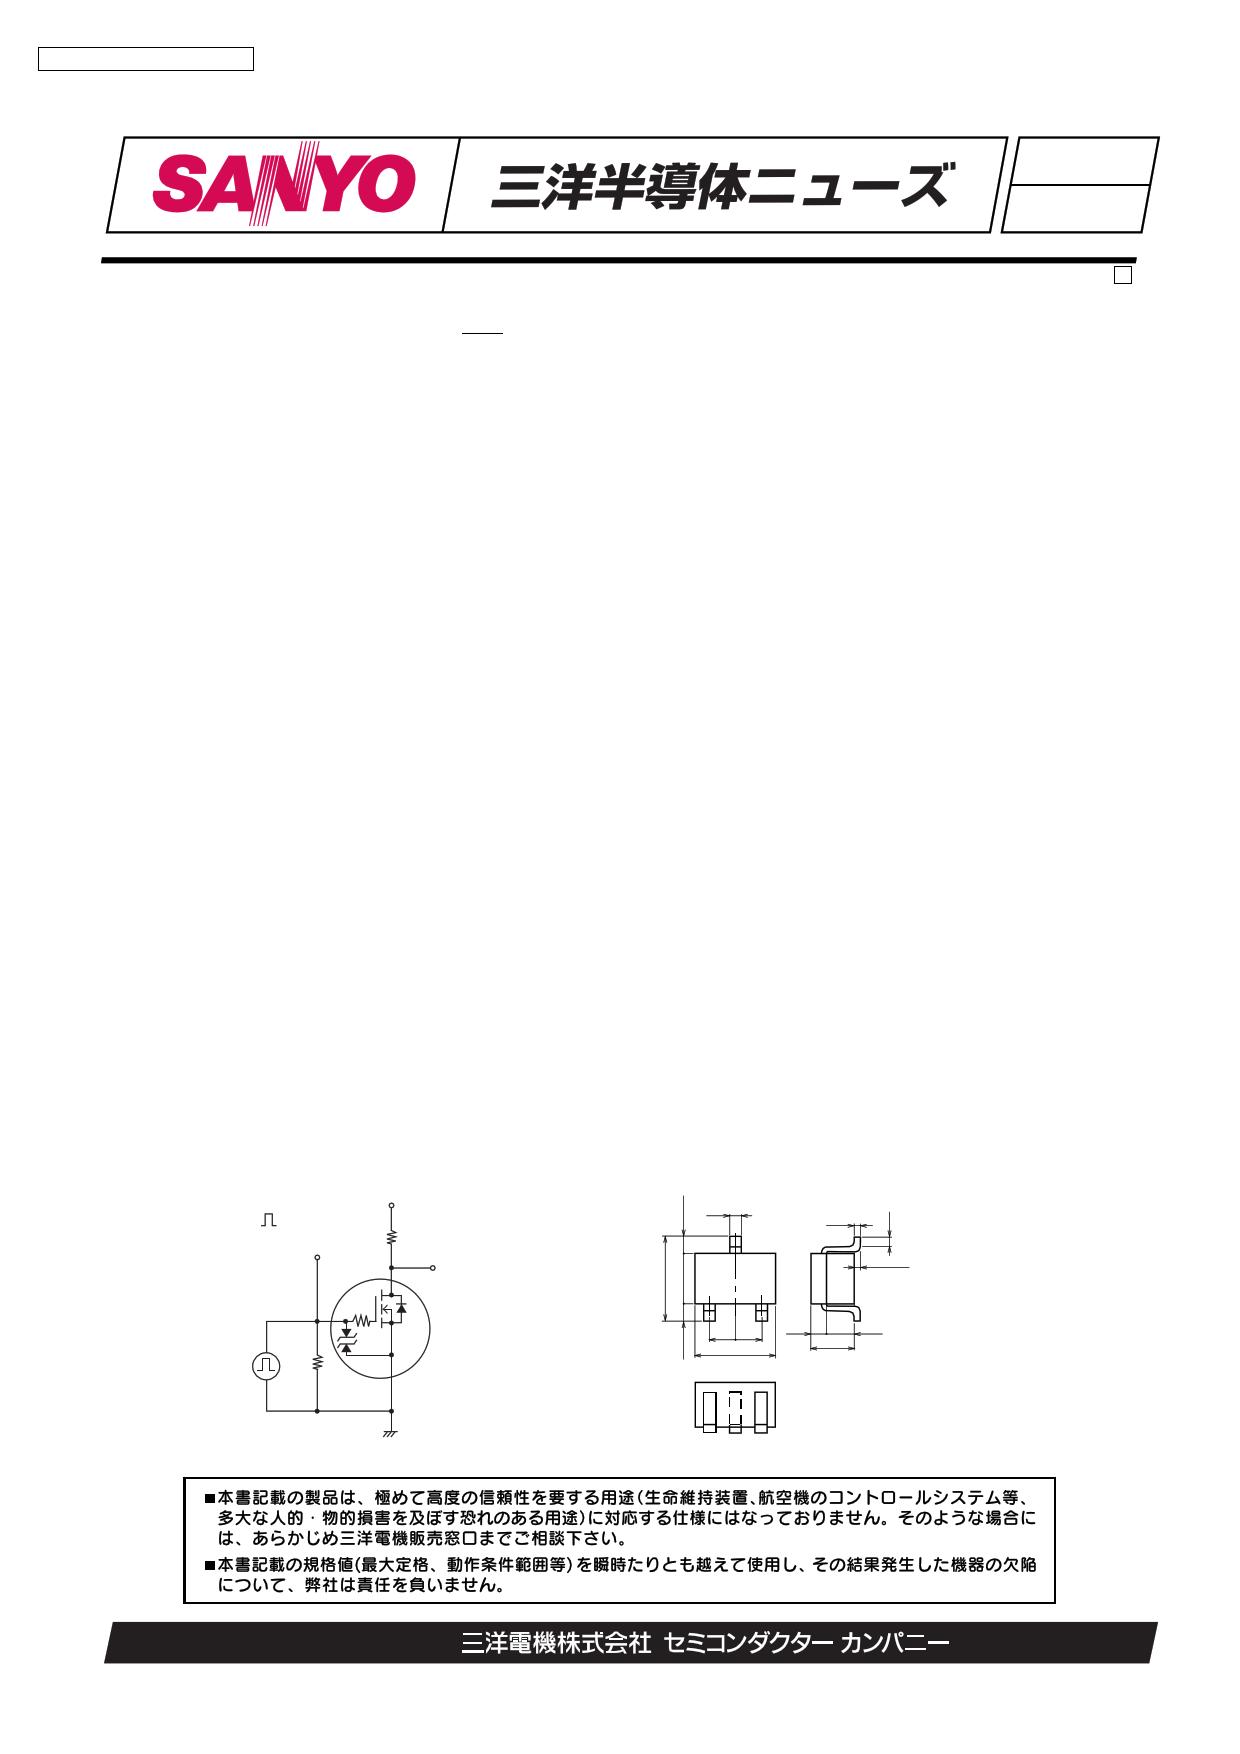 400CNQ040 دیتاشیت PDF